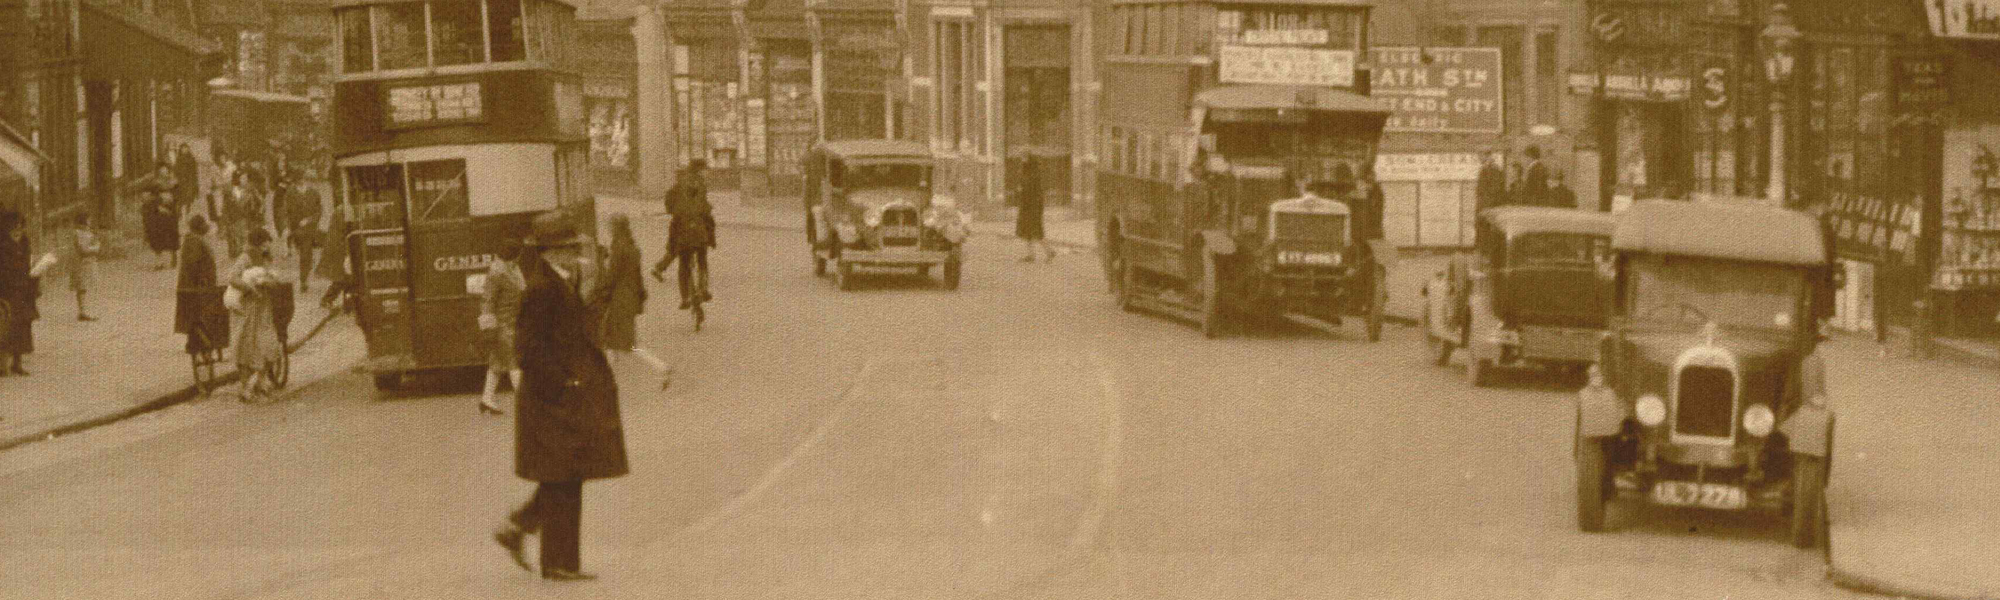 The Blackheath Society Photography Archive